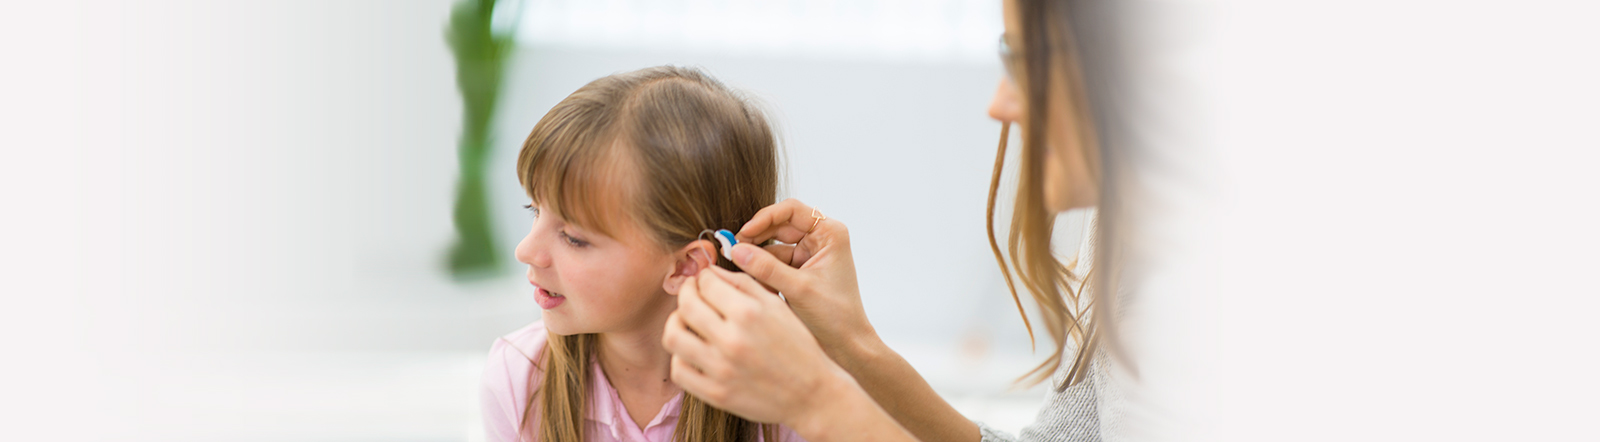 Hearing-Aid-Otolaryngology-Associates-of-Tennessee_wide.jpg